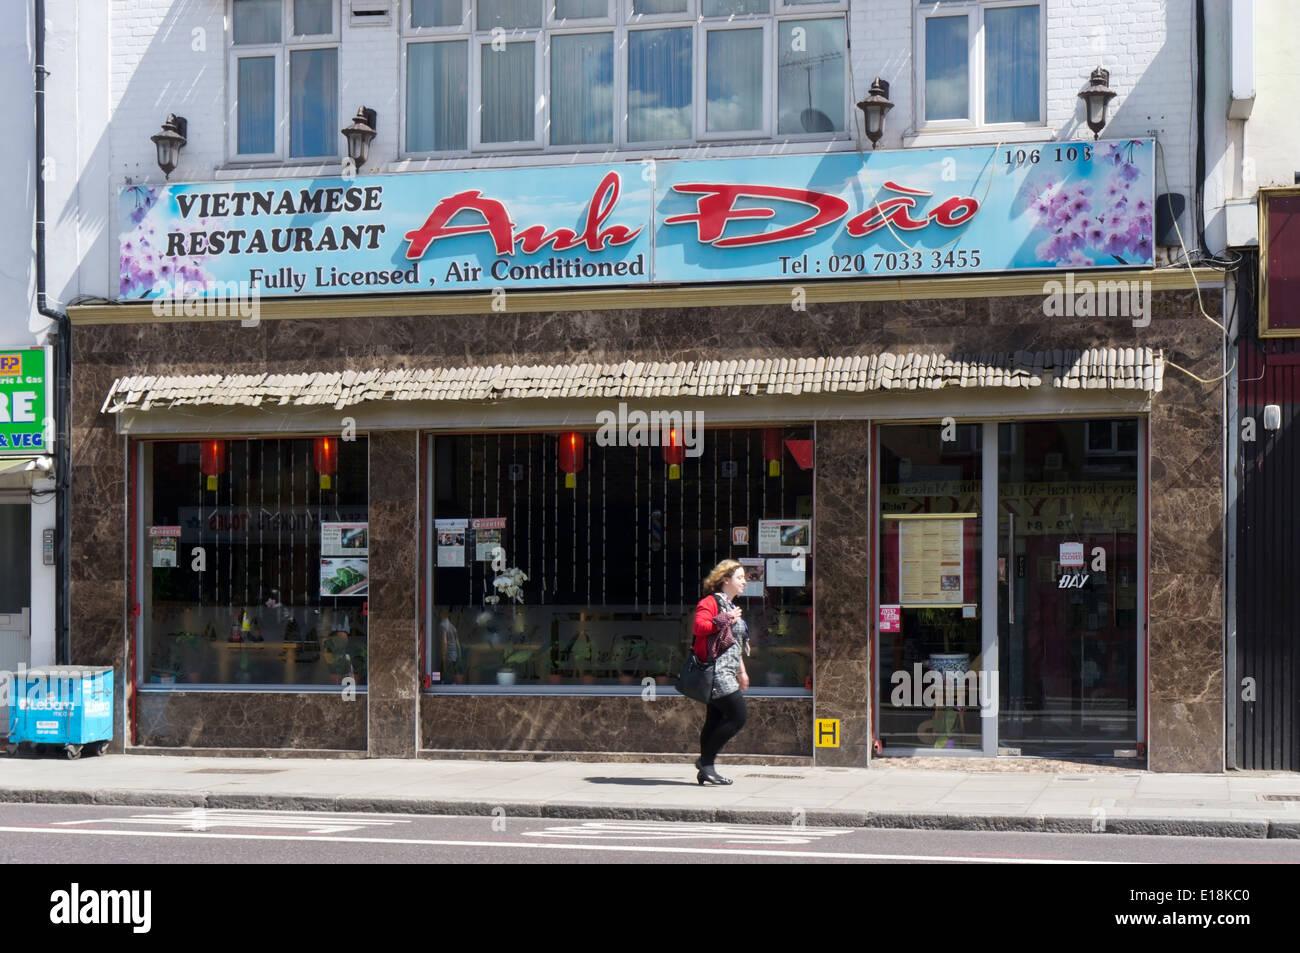 Stock Photo - The Anh Dào Vietnamese restaurant in Kingsland Road, East London